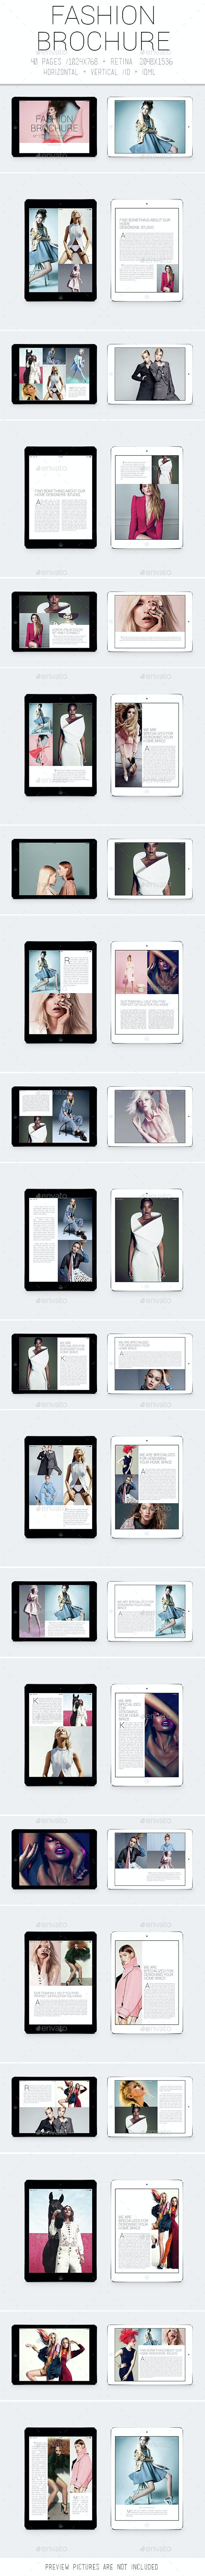 Ipad&Tablet Fashion Brochure - Digital Magazines ePublishing